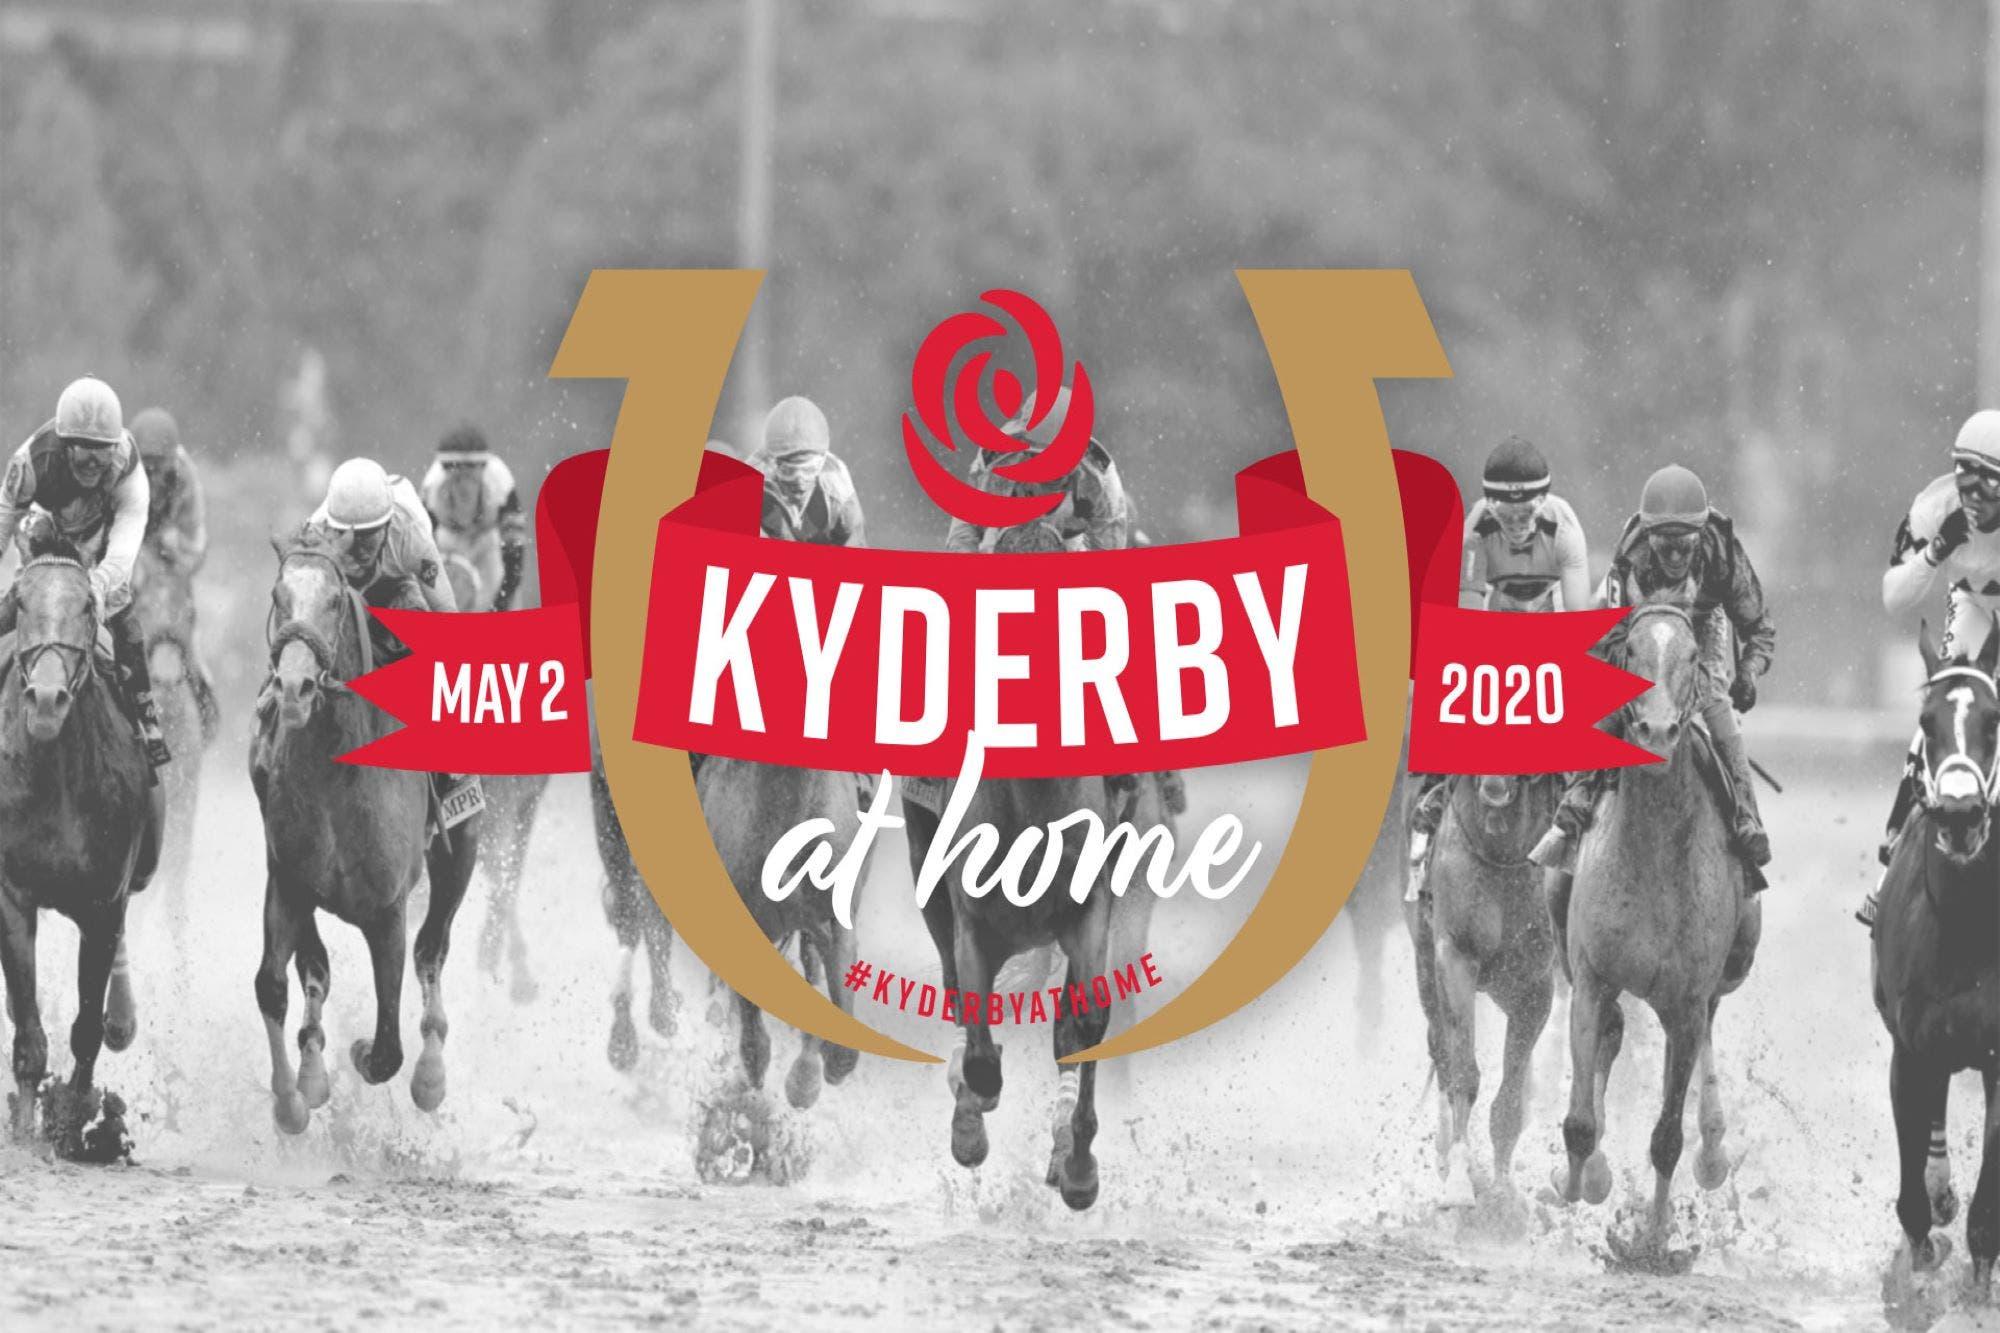 Coronavirus. Inspirado en Jimmy Fallon, el Kentucky Derby tendrá otra versión atípica televisada, para recaudar fondos